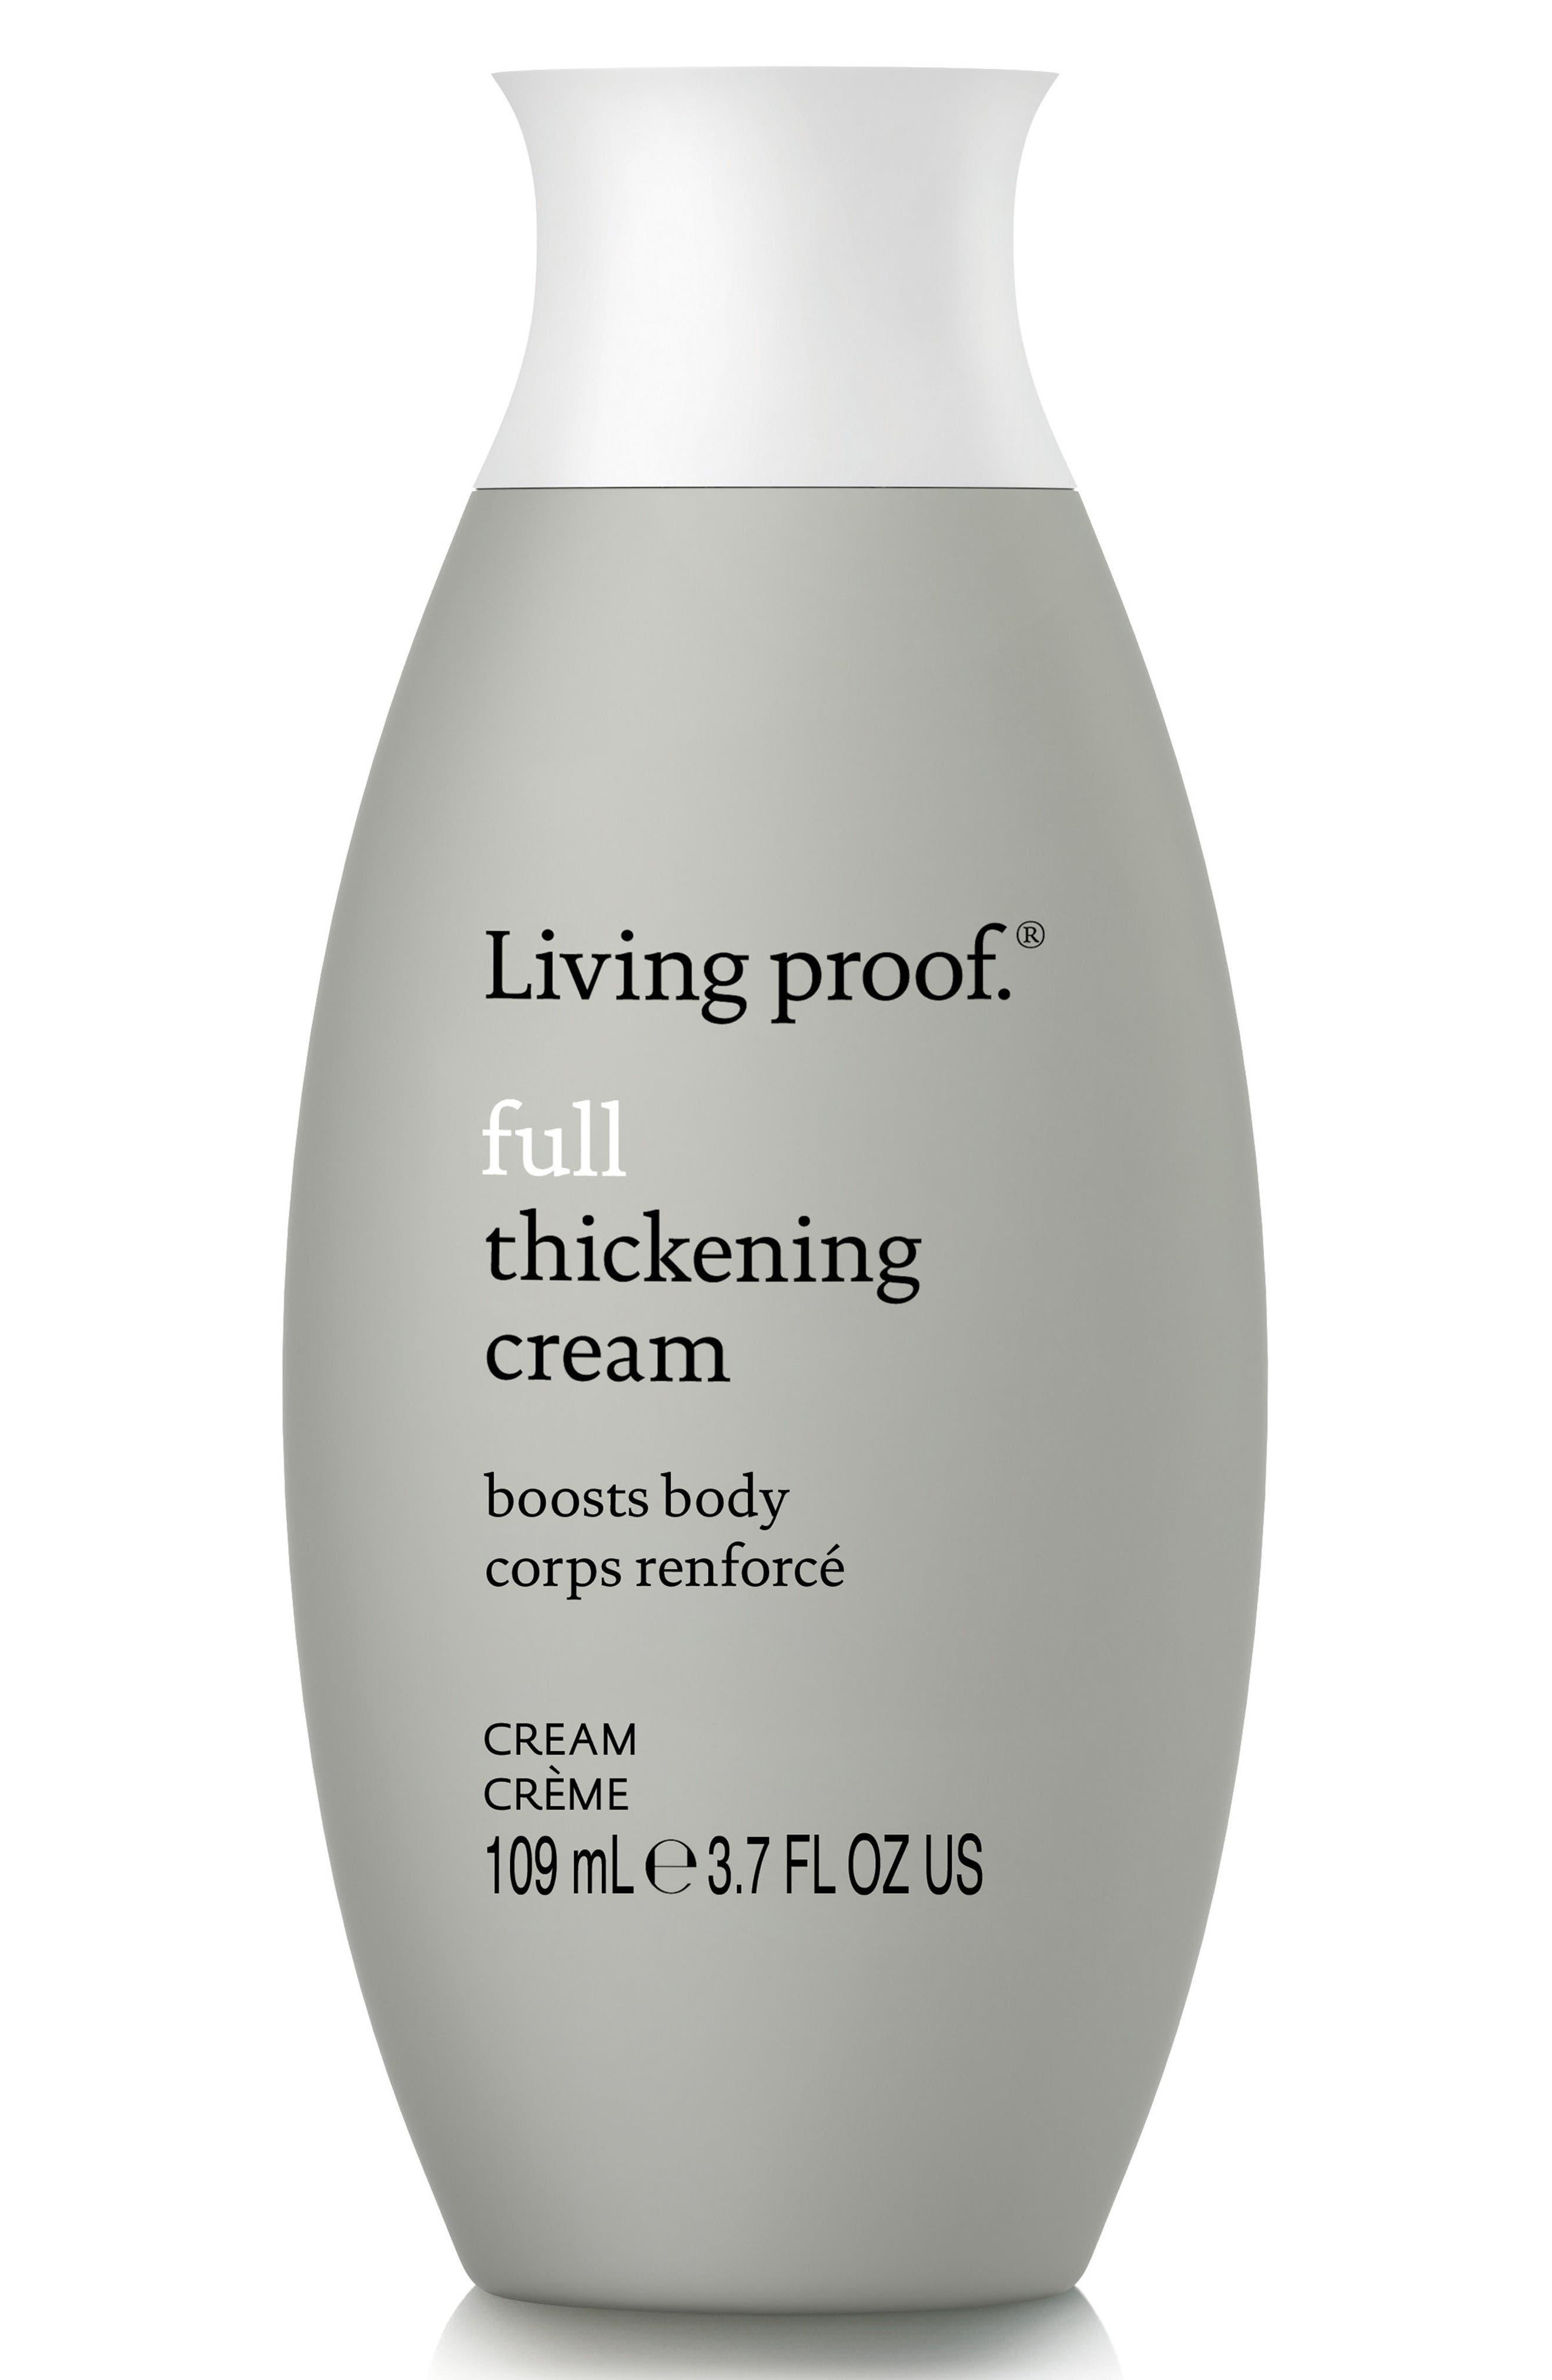 Living proof® Full Thickening Cream